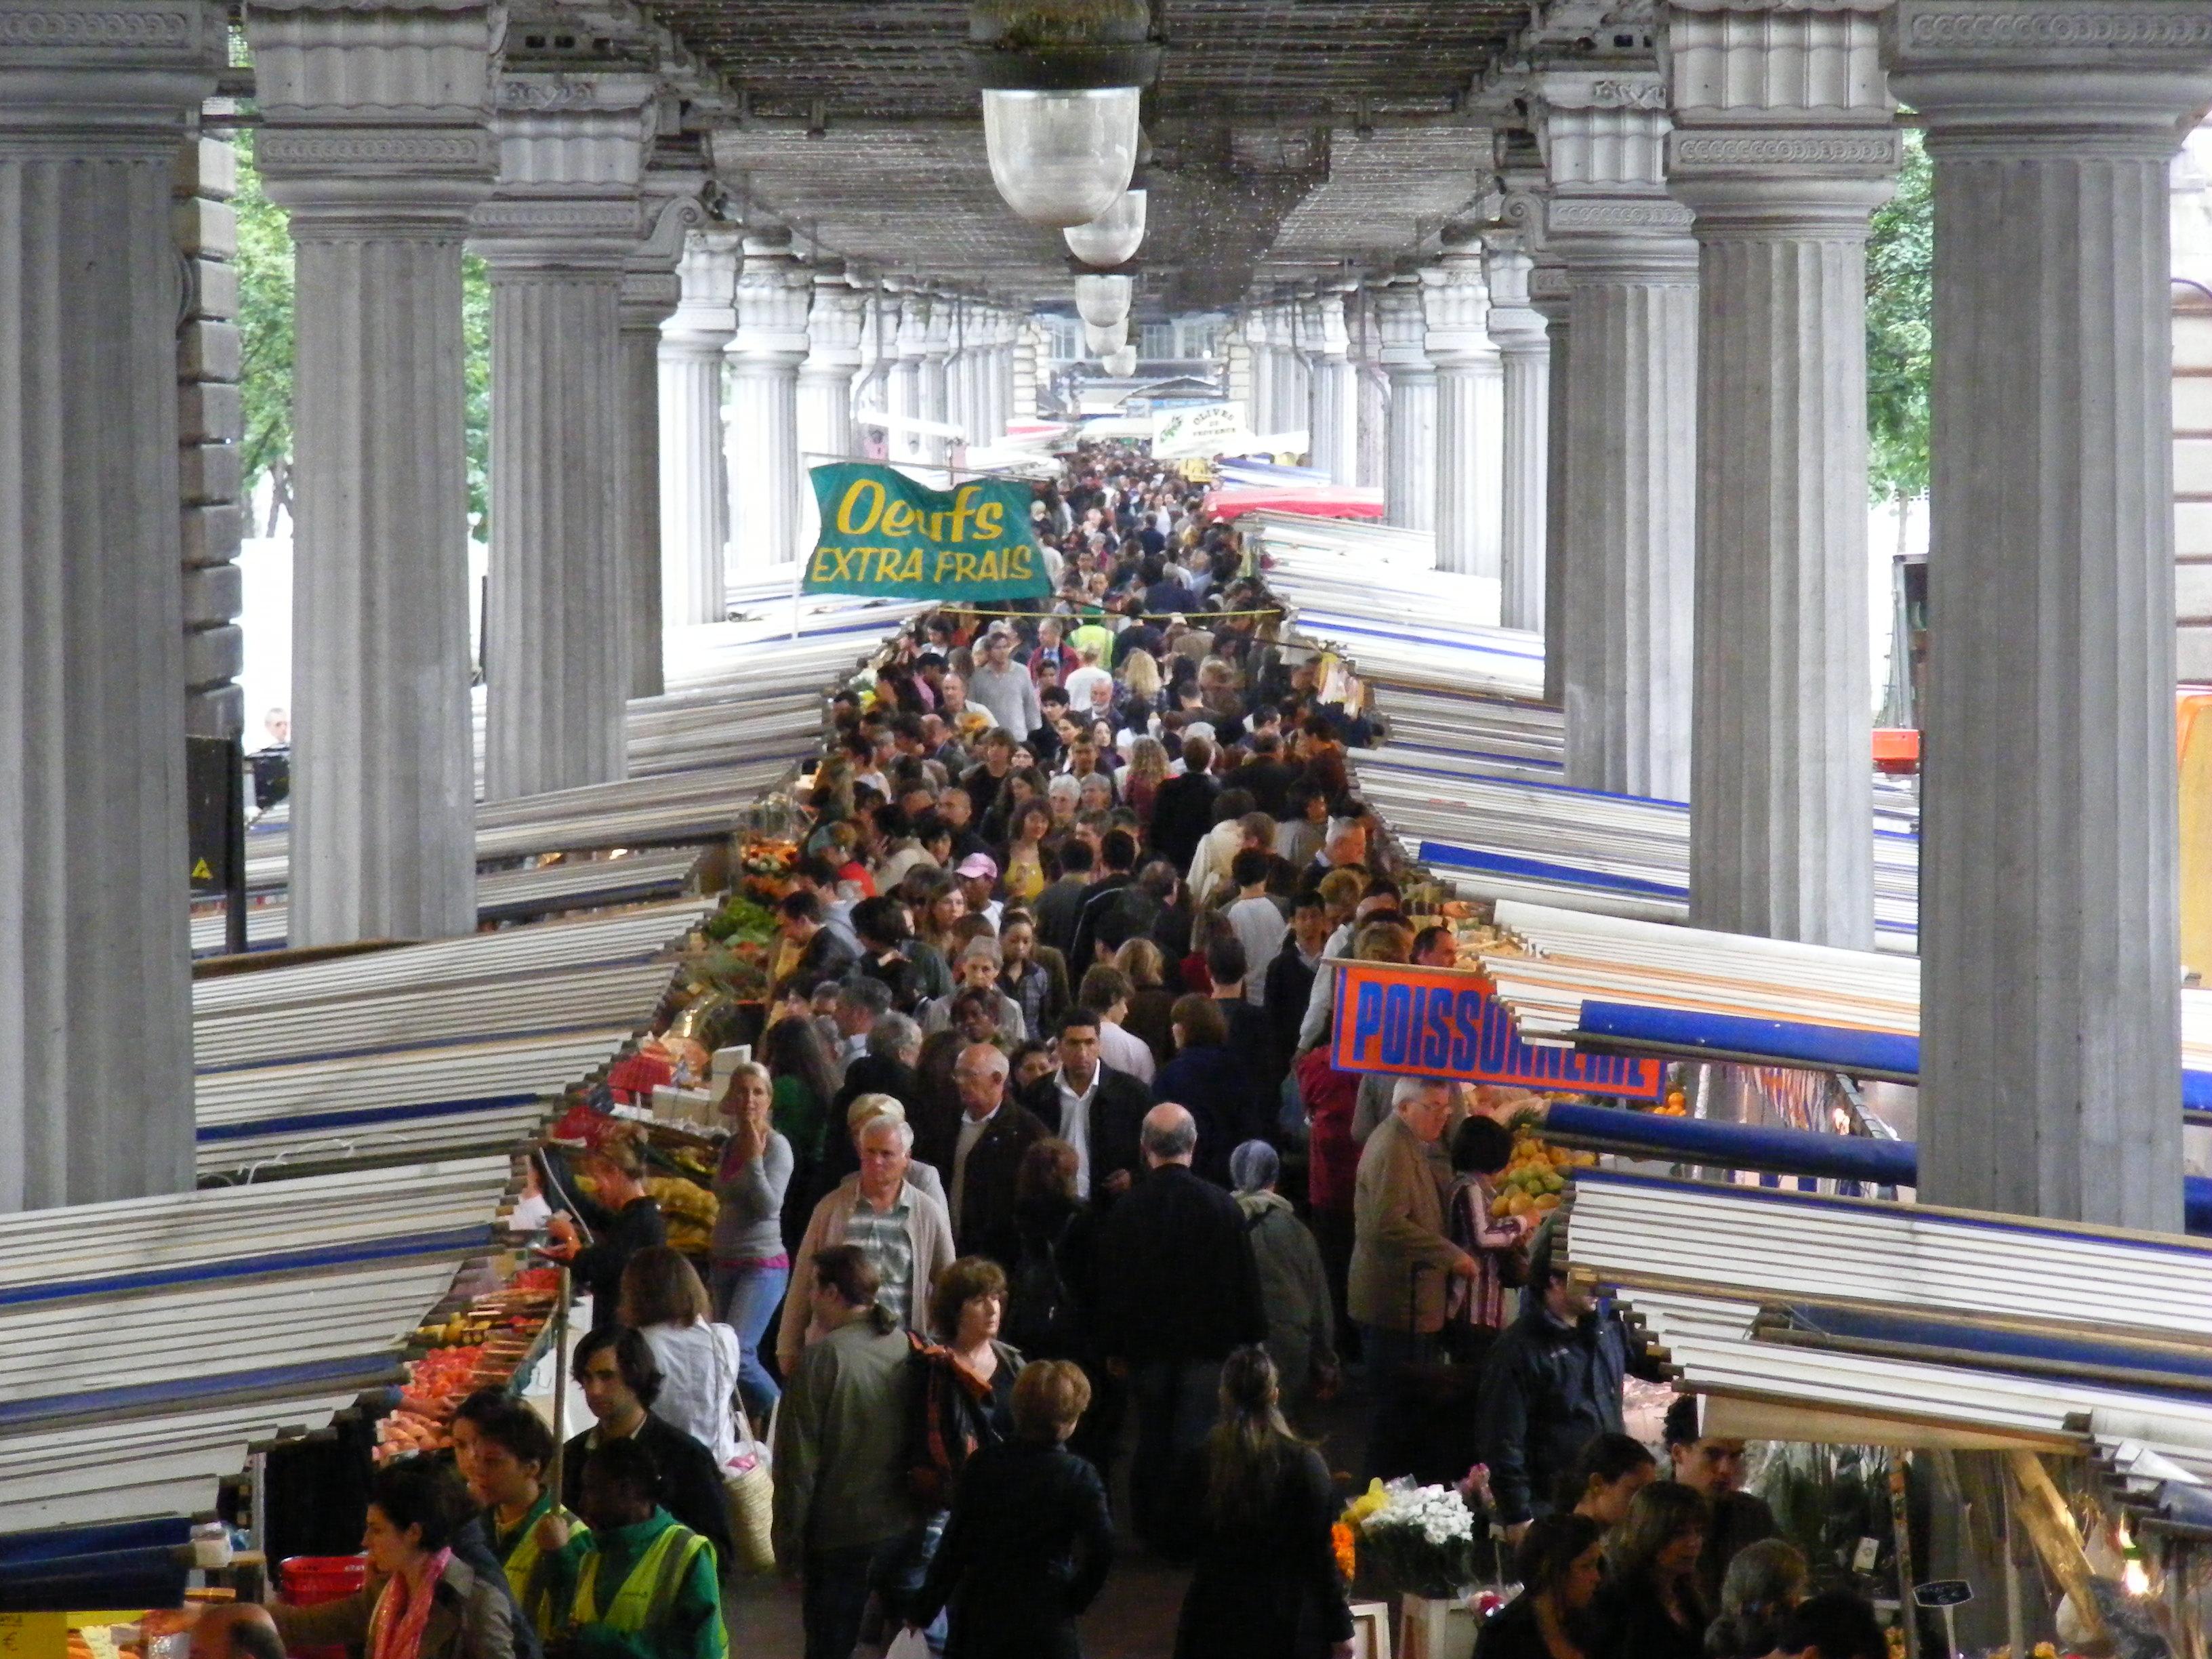 File a public market in paris march de grenelle located in boulevard grenell - Marche de tissu a paris ...